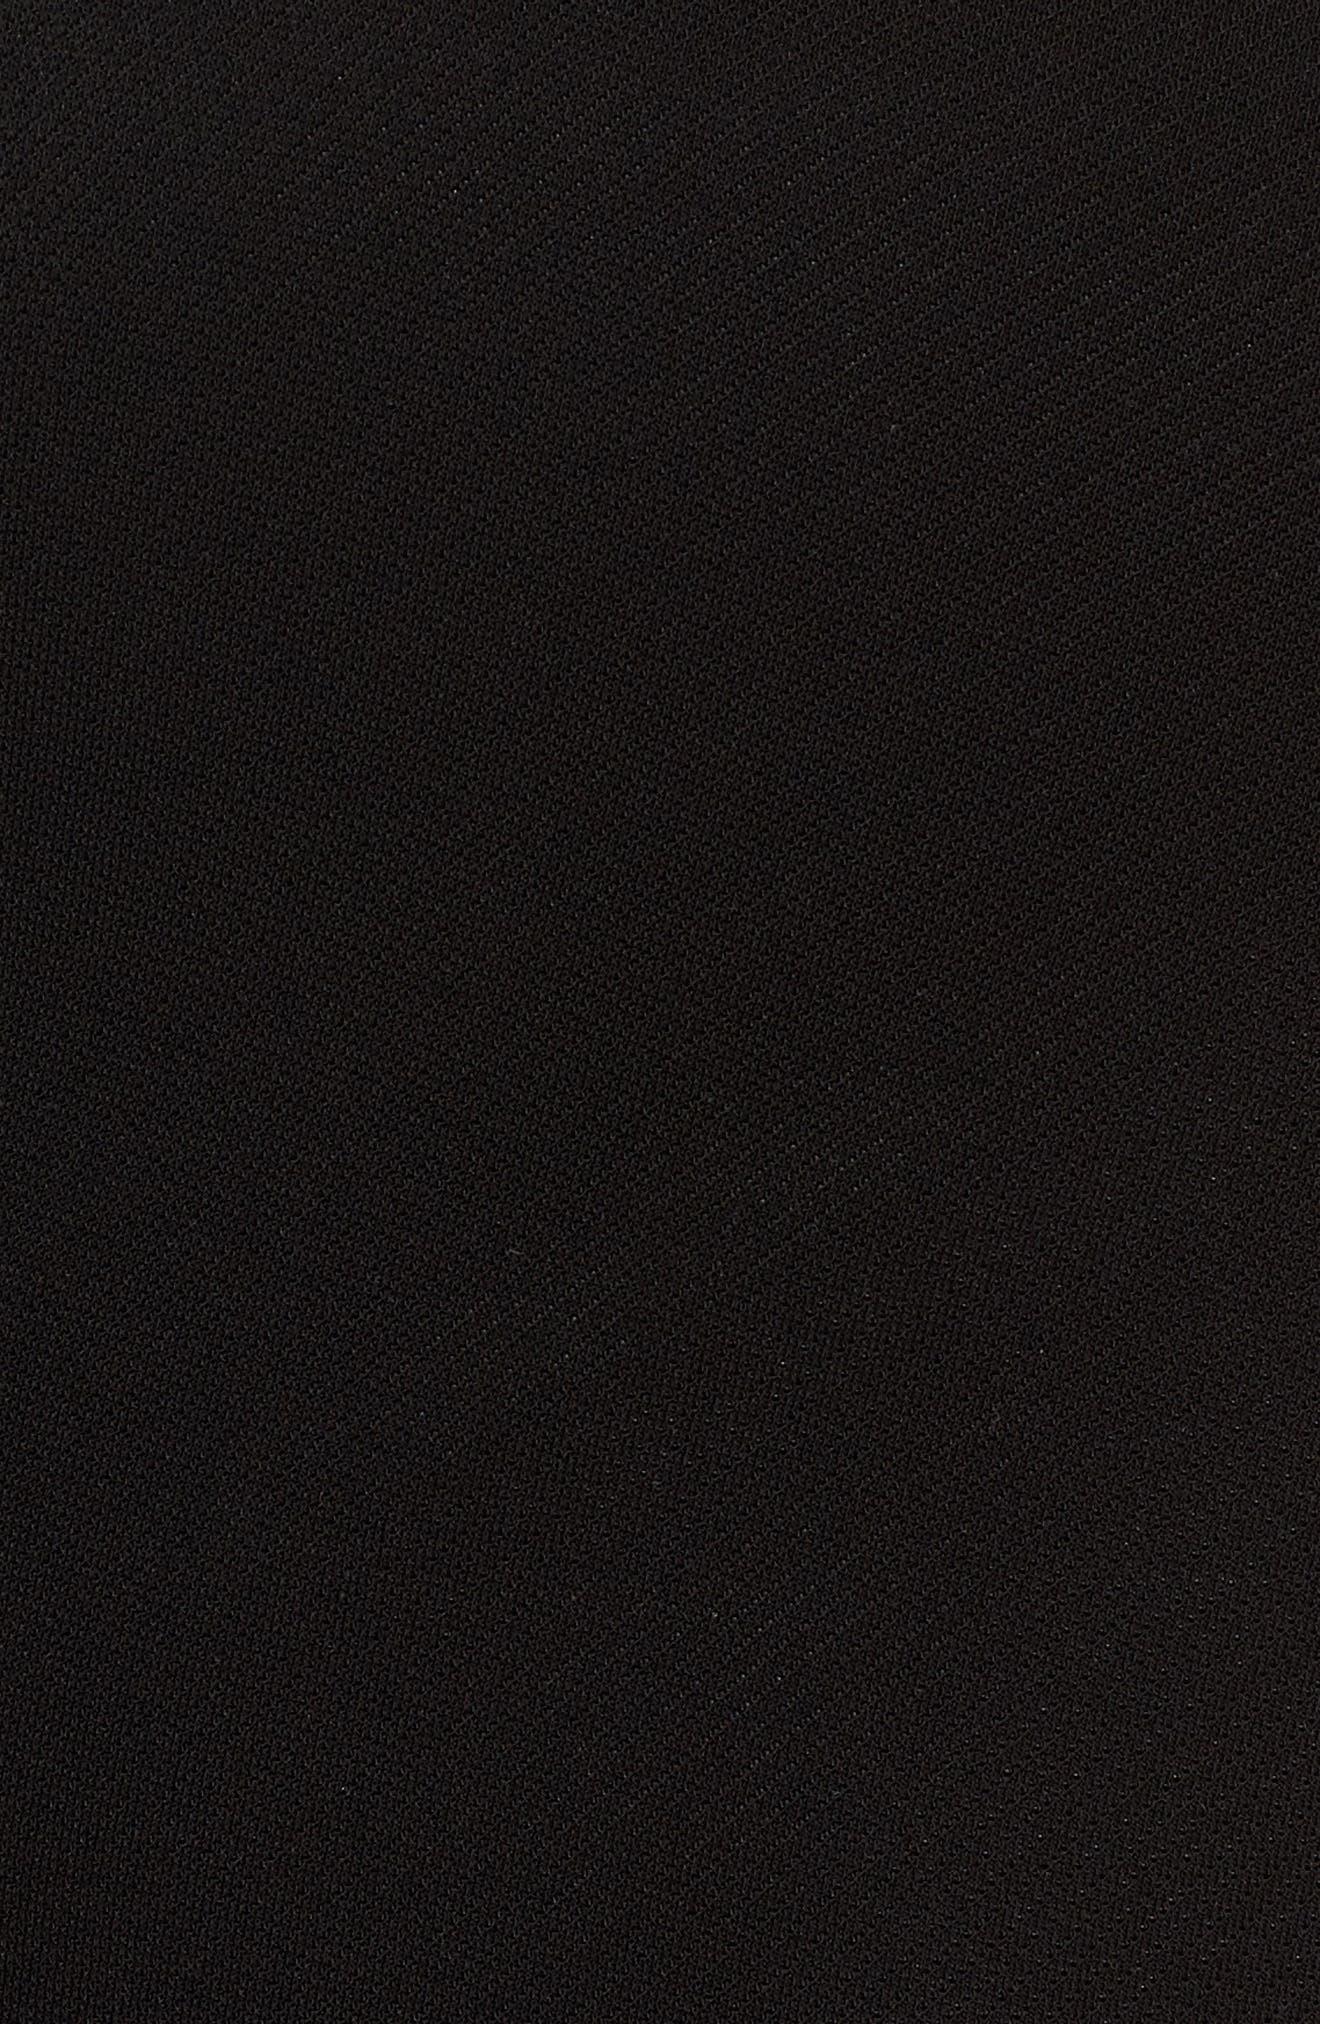 Erela Ruched Sheath Dress,                             Alternate thumbnail 6, color,                             Black